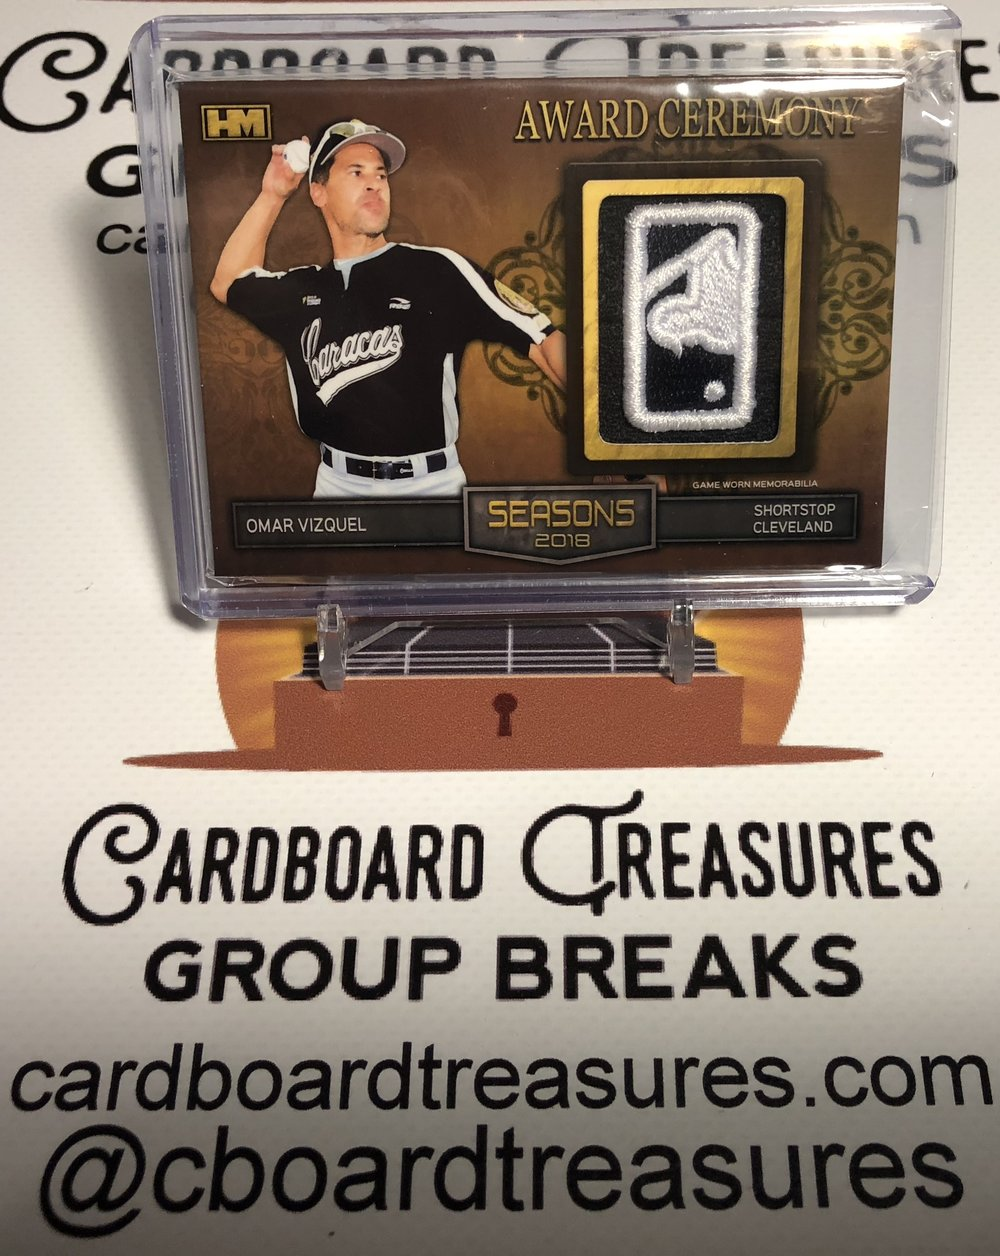 Hits Seasons 2018 Omar Vizquel Award Ceremony MLB Logoman Patch 2/2